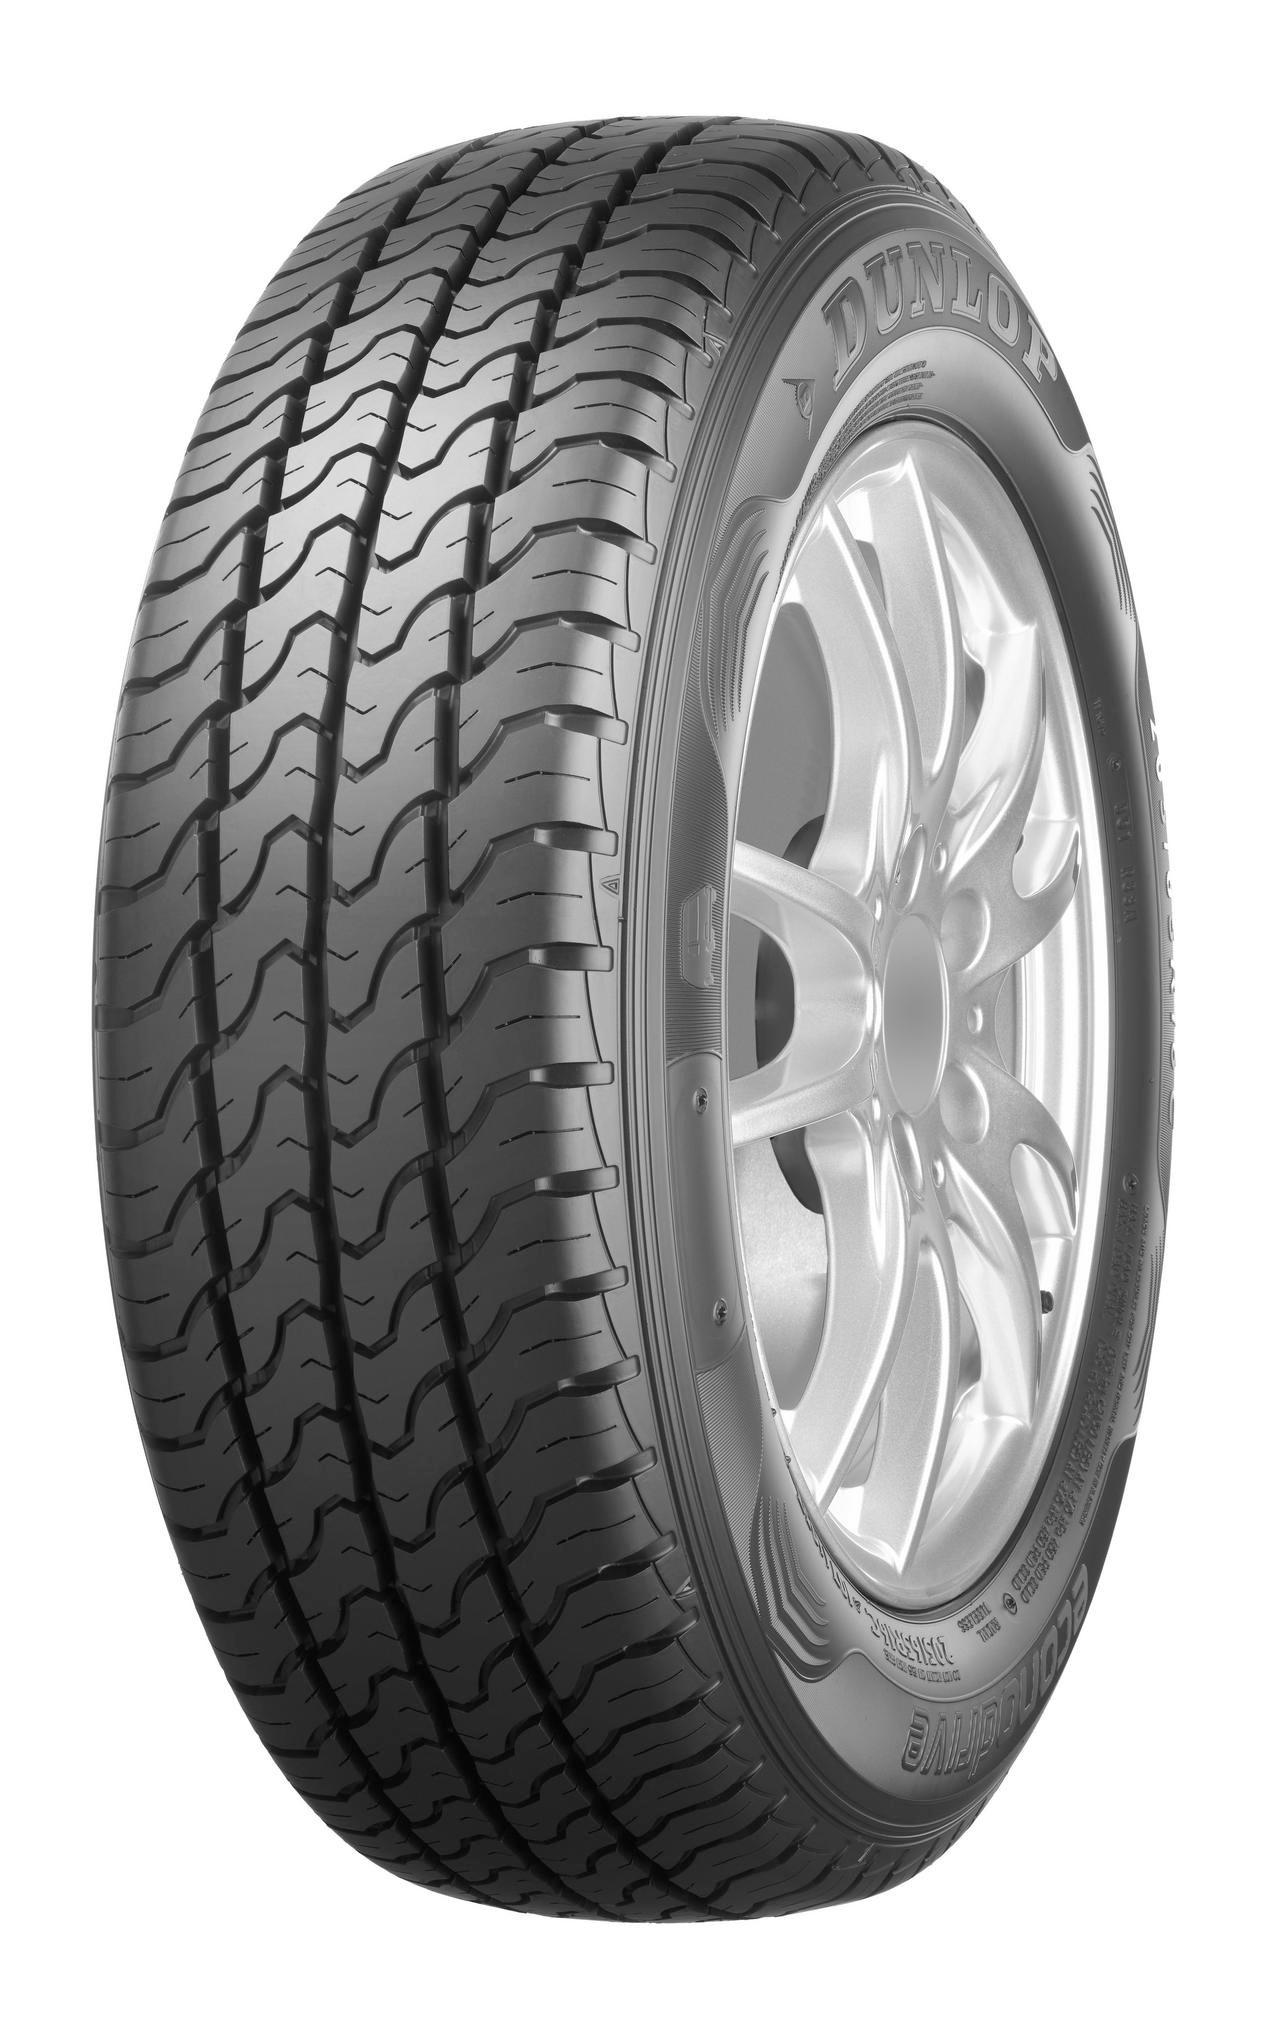 Dunlop Econodrive 235/65R16C 115/113R